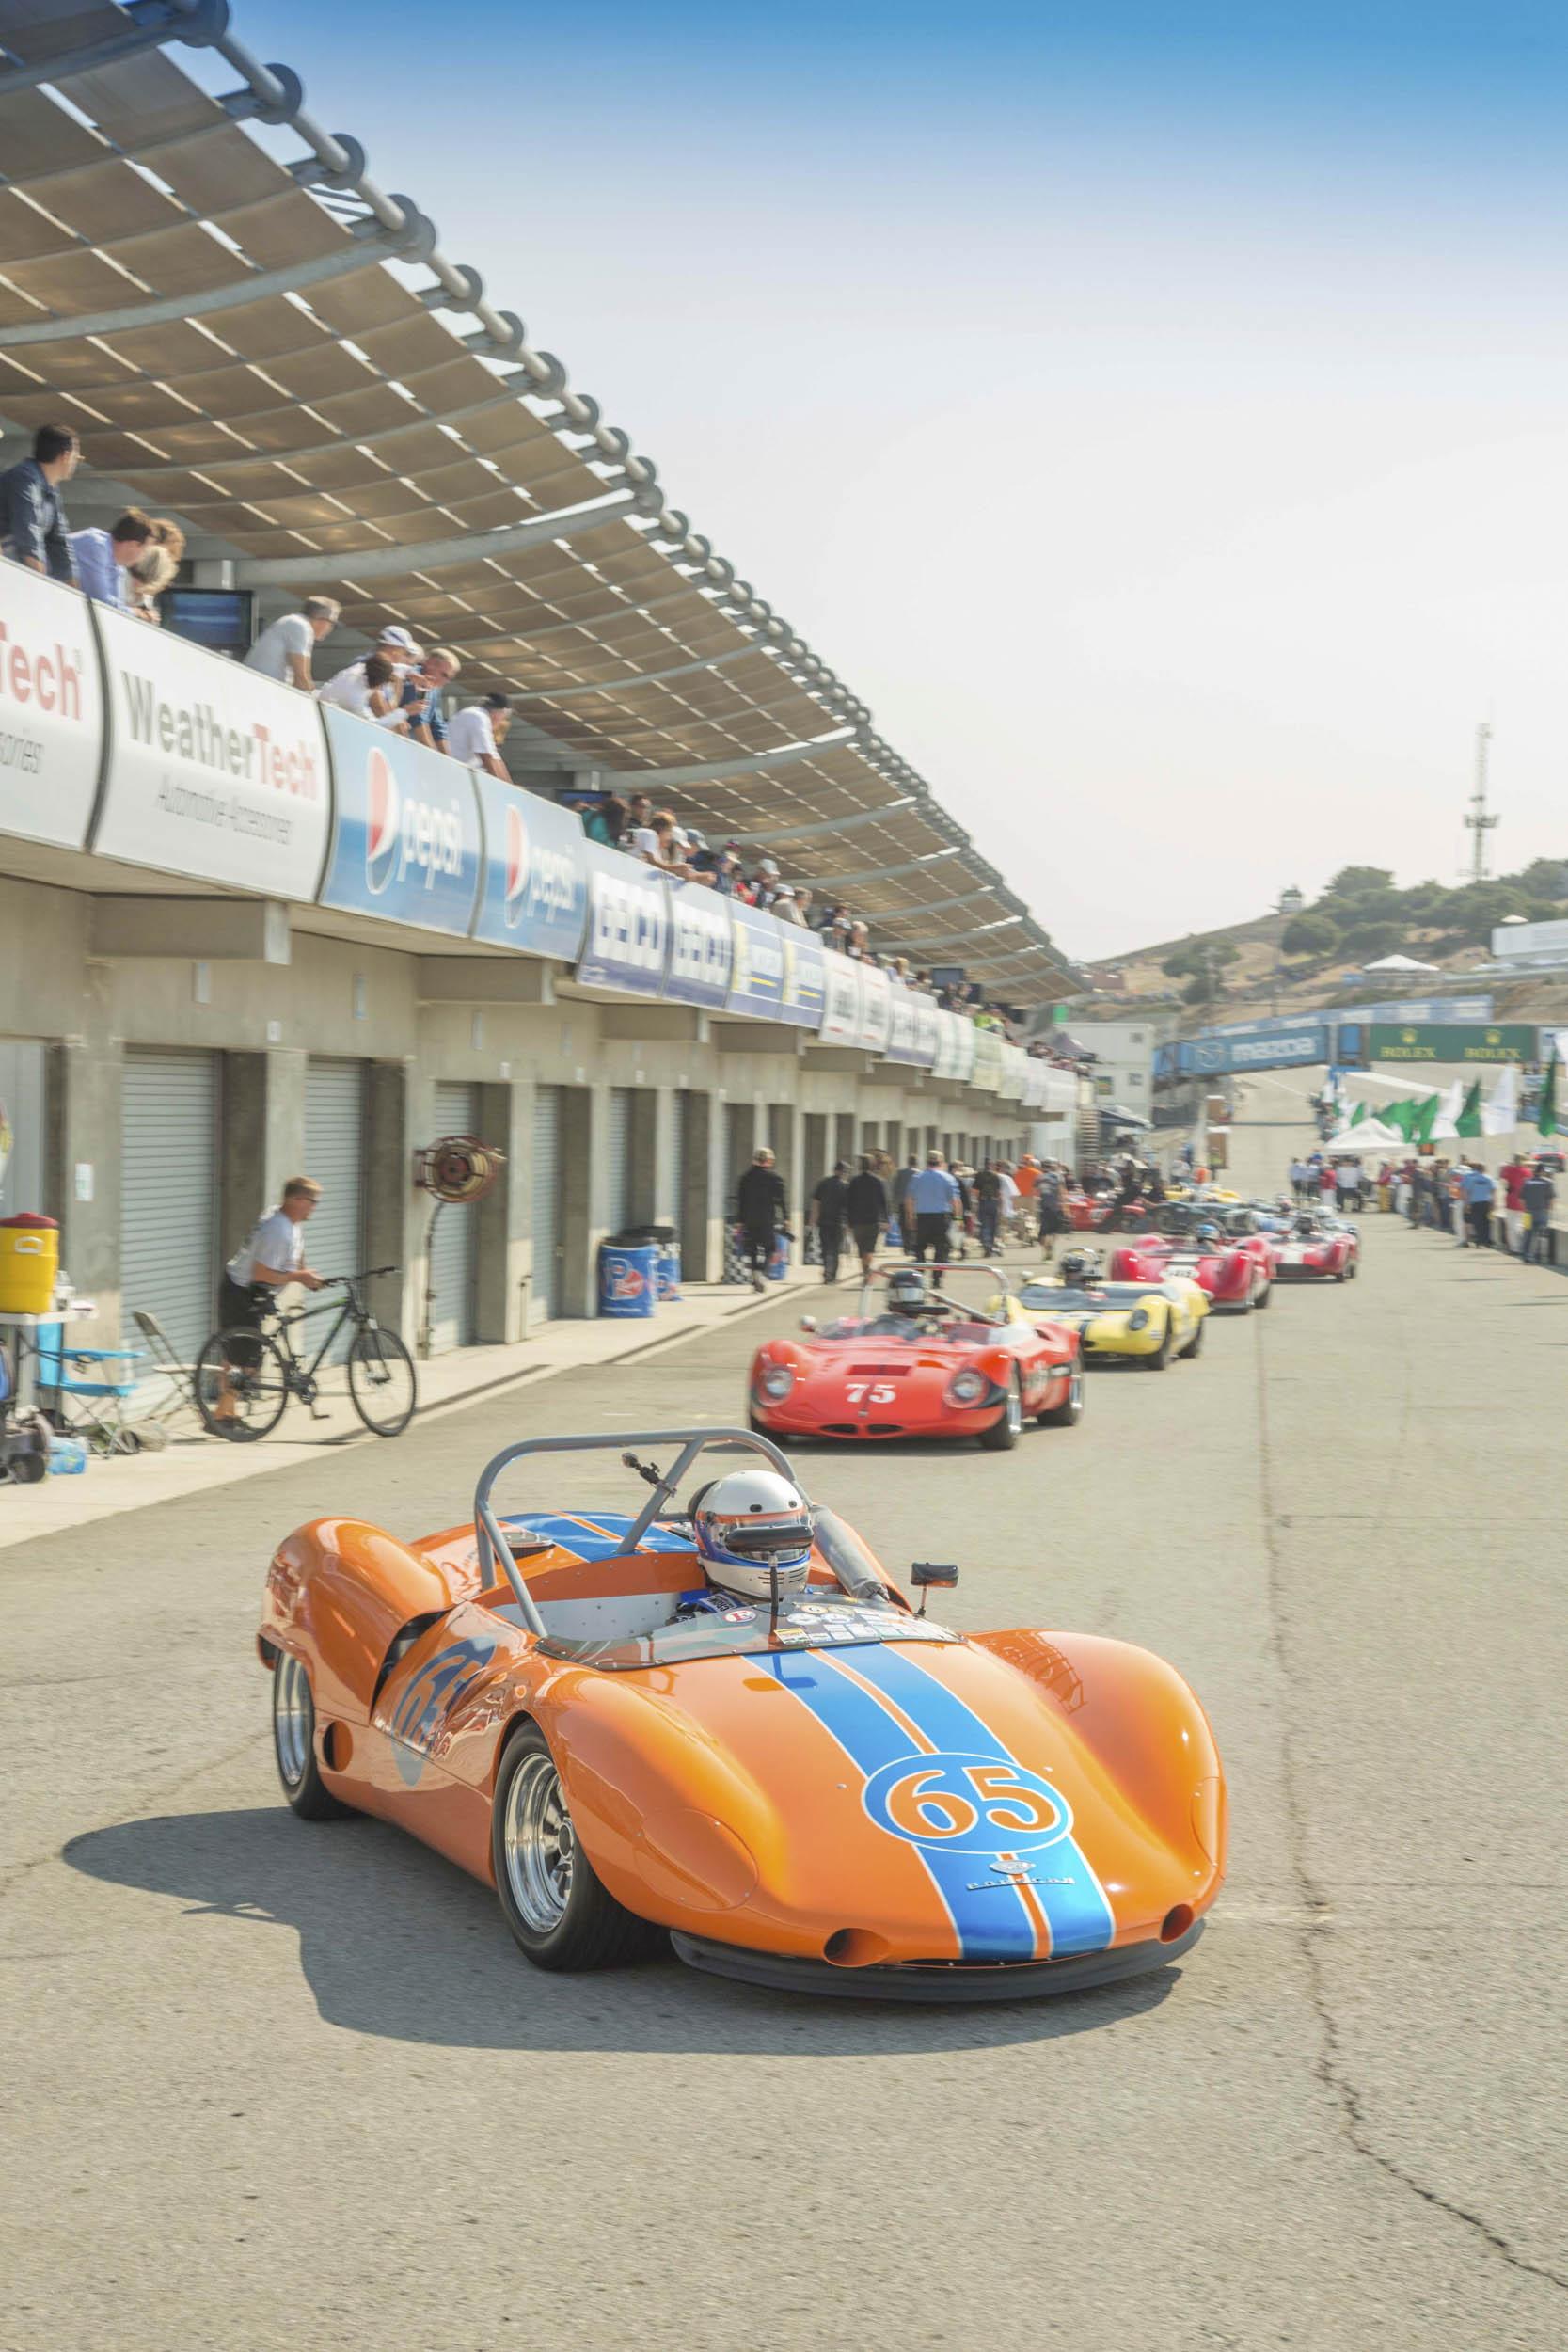 Rolex Monterey Motorsports Reunion at WeatherTech Raceway Laguna Seca paddock